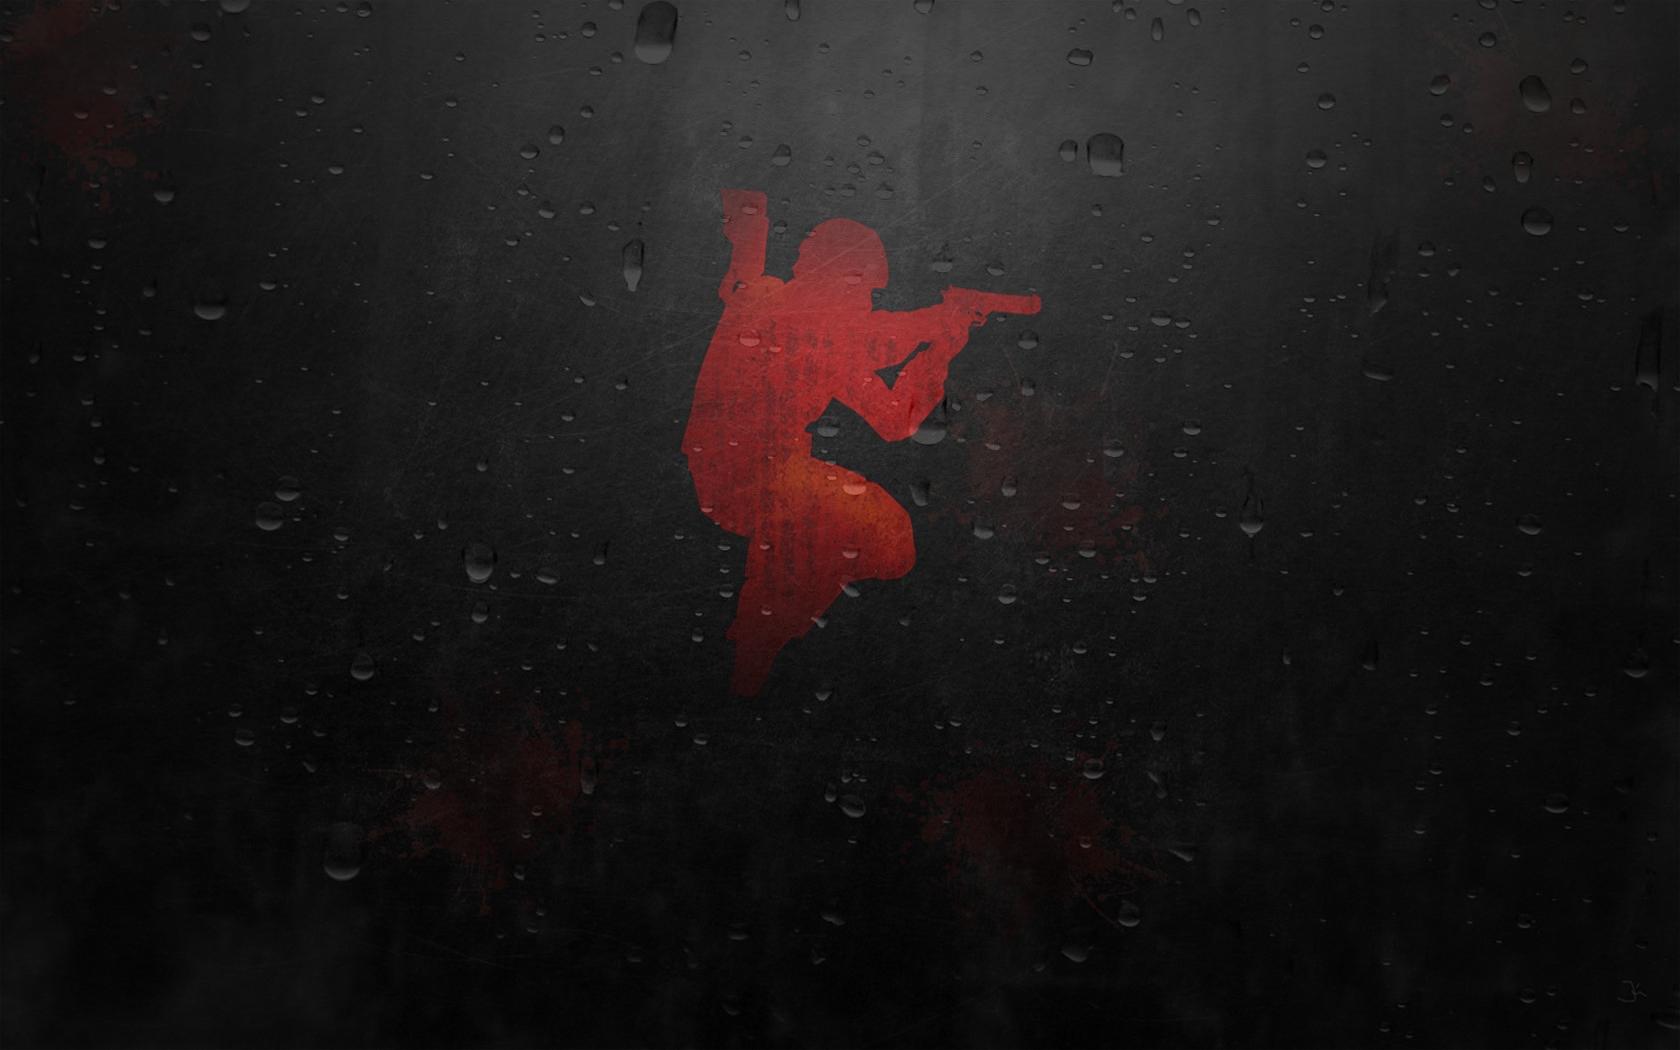 Wallpaper Counter Strike Water Background Soldier Pistol